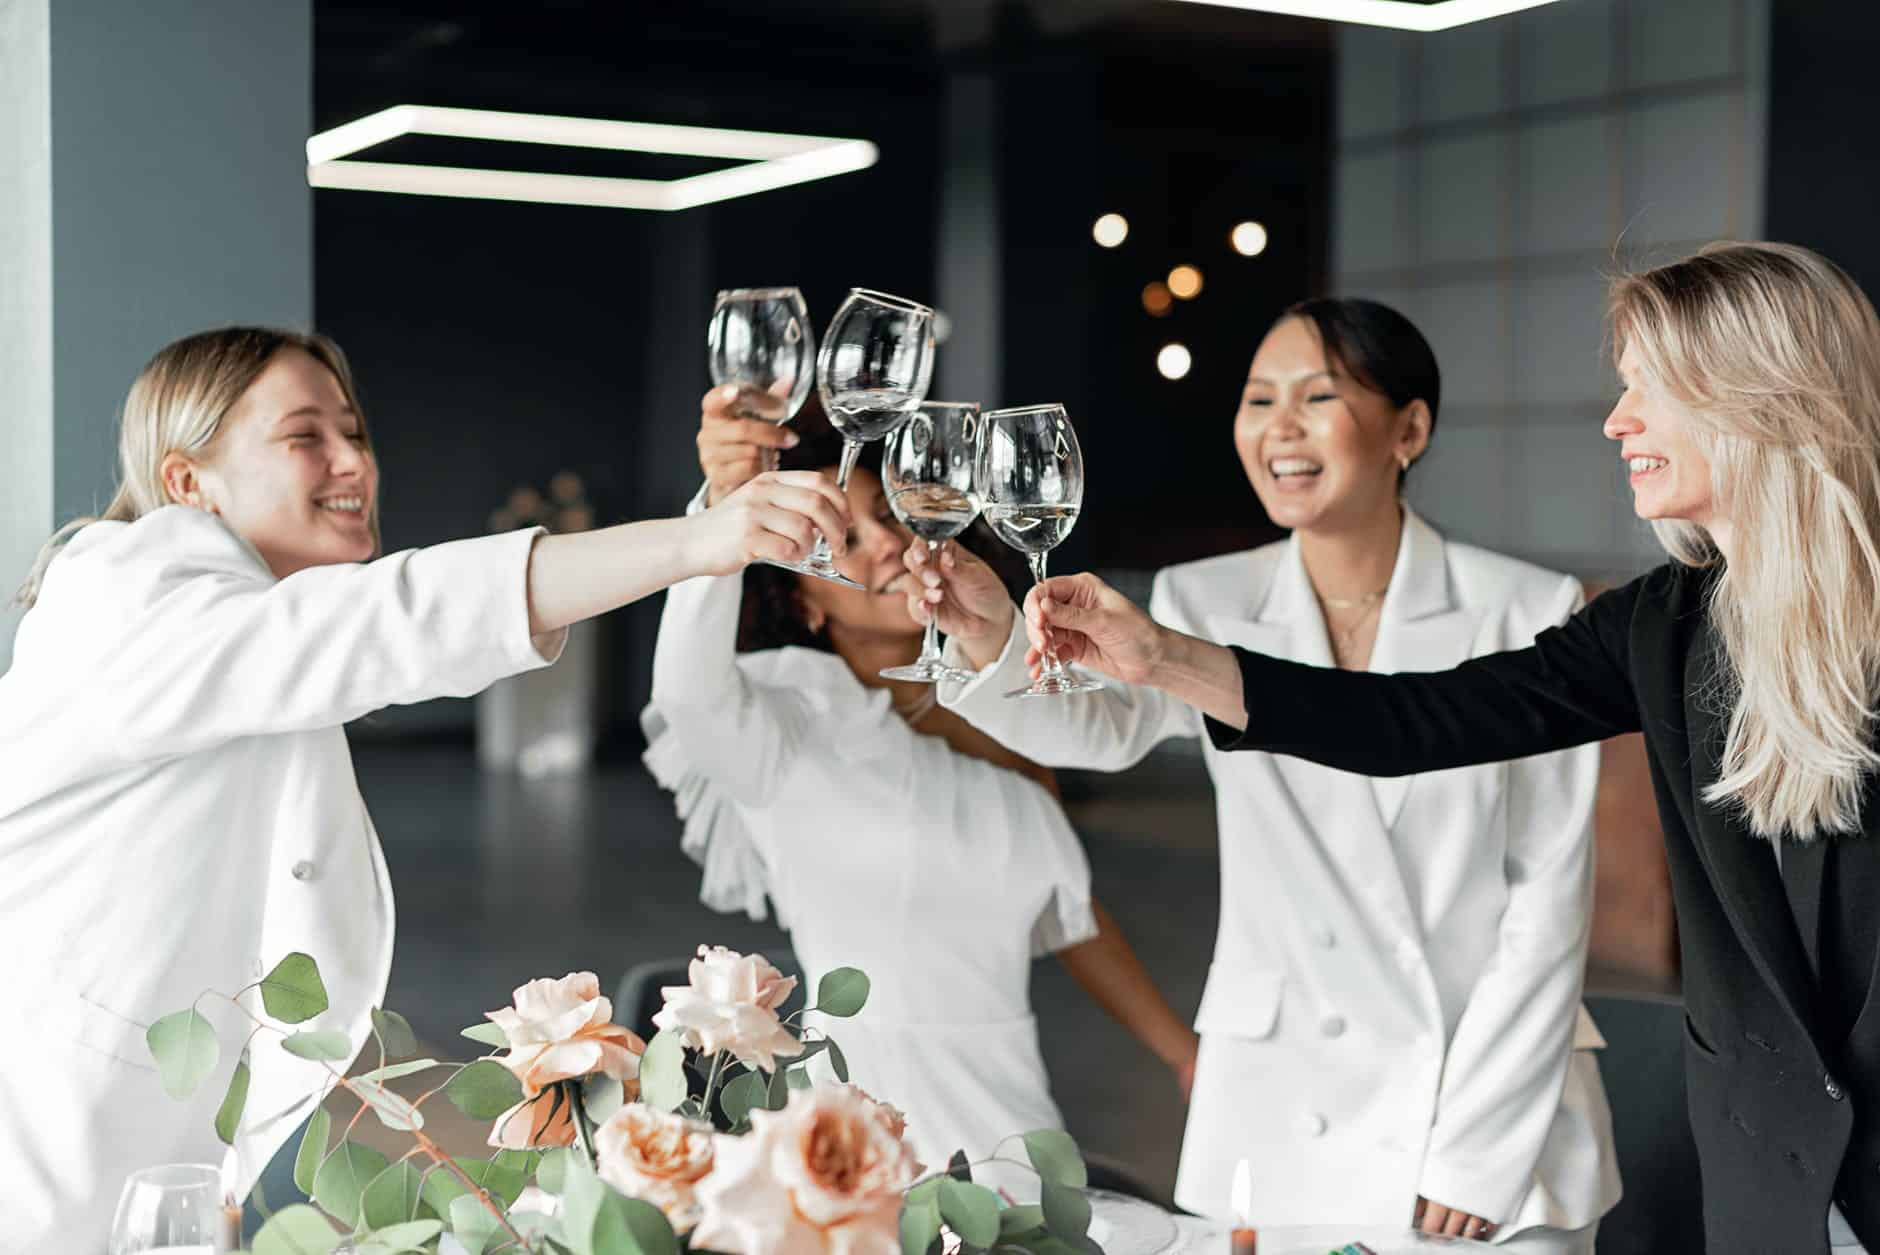 women clinking wine glasses